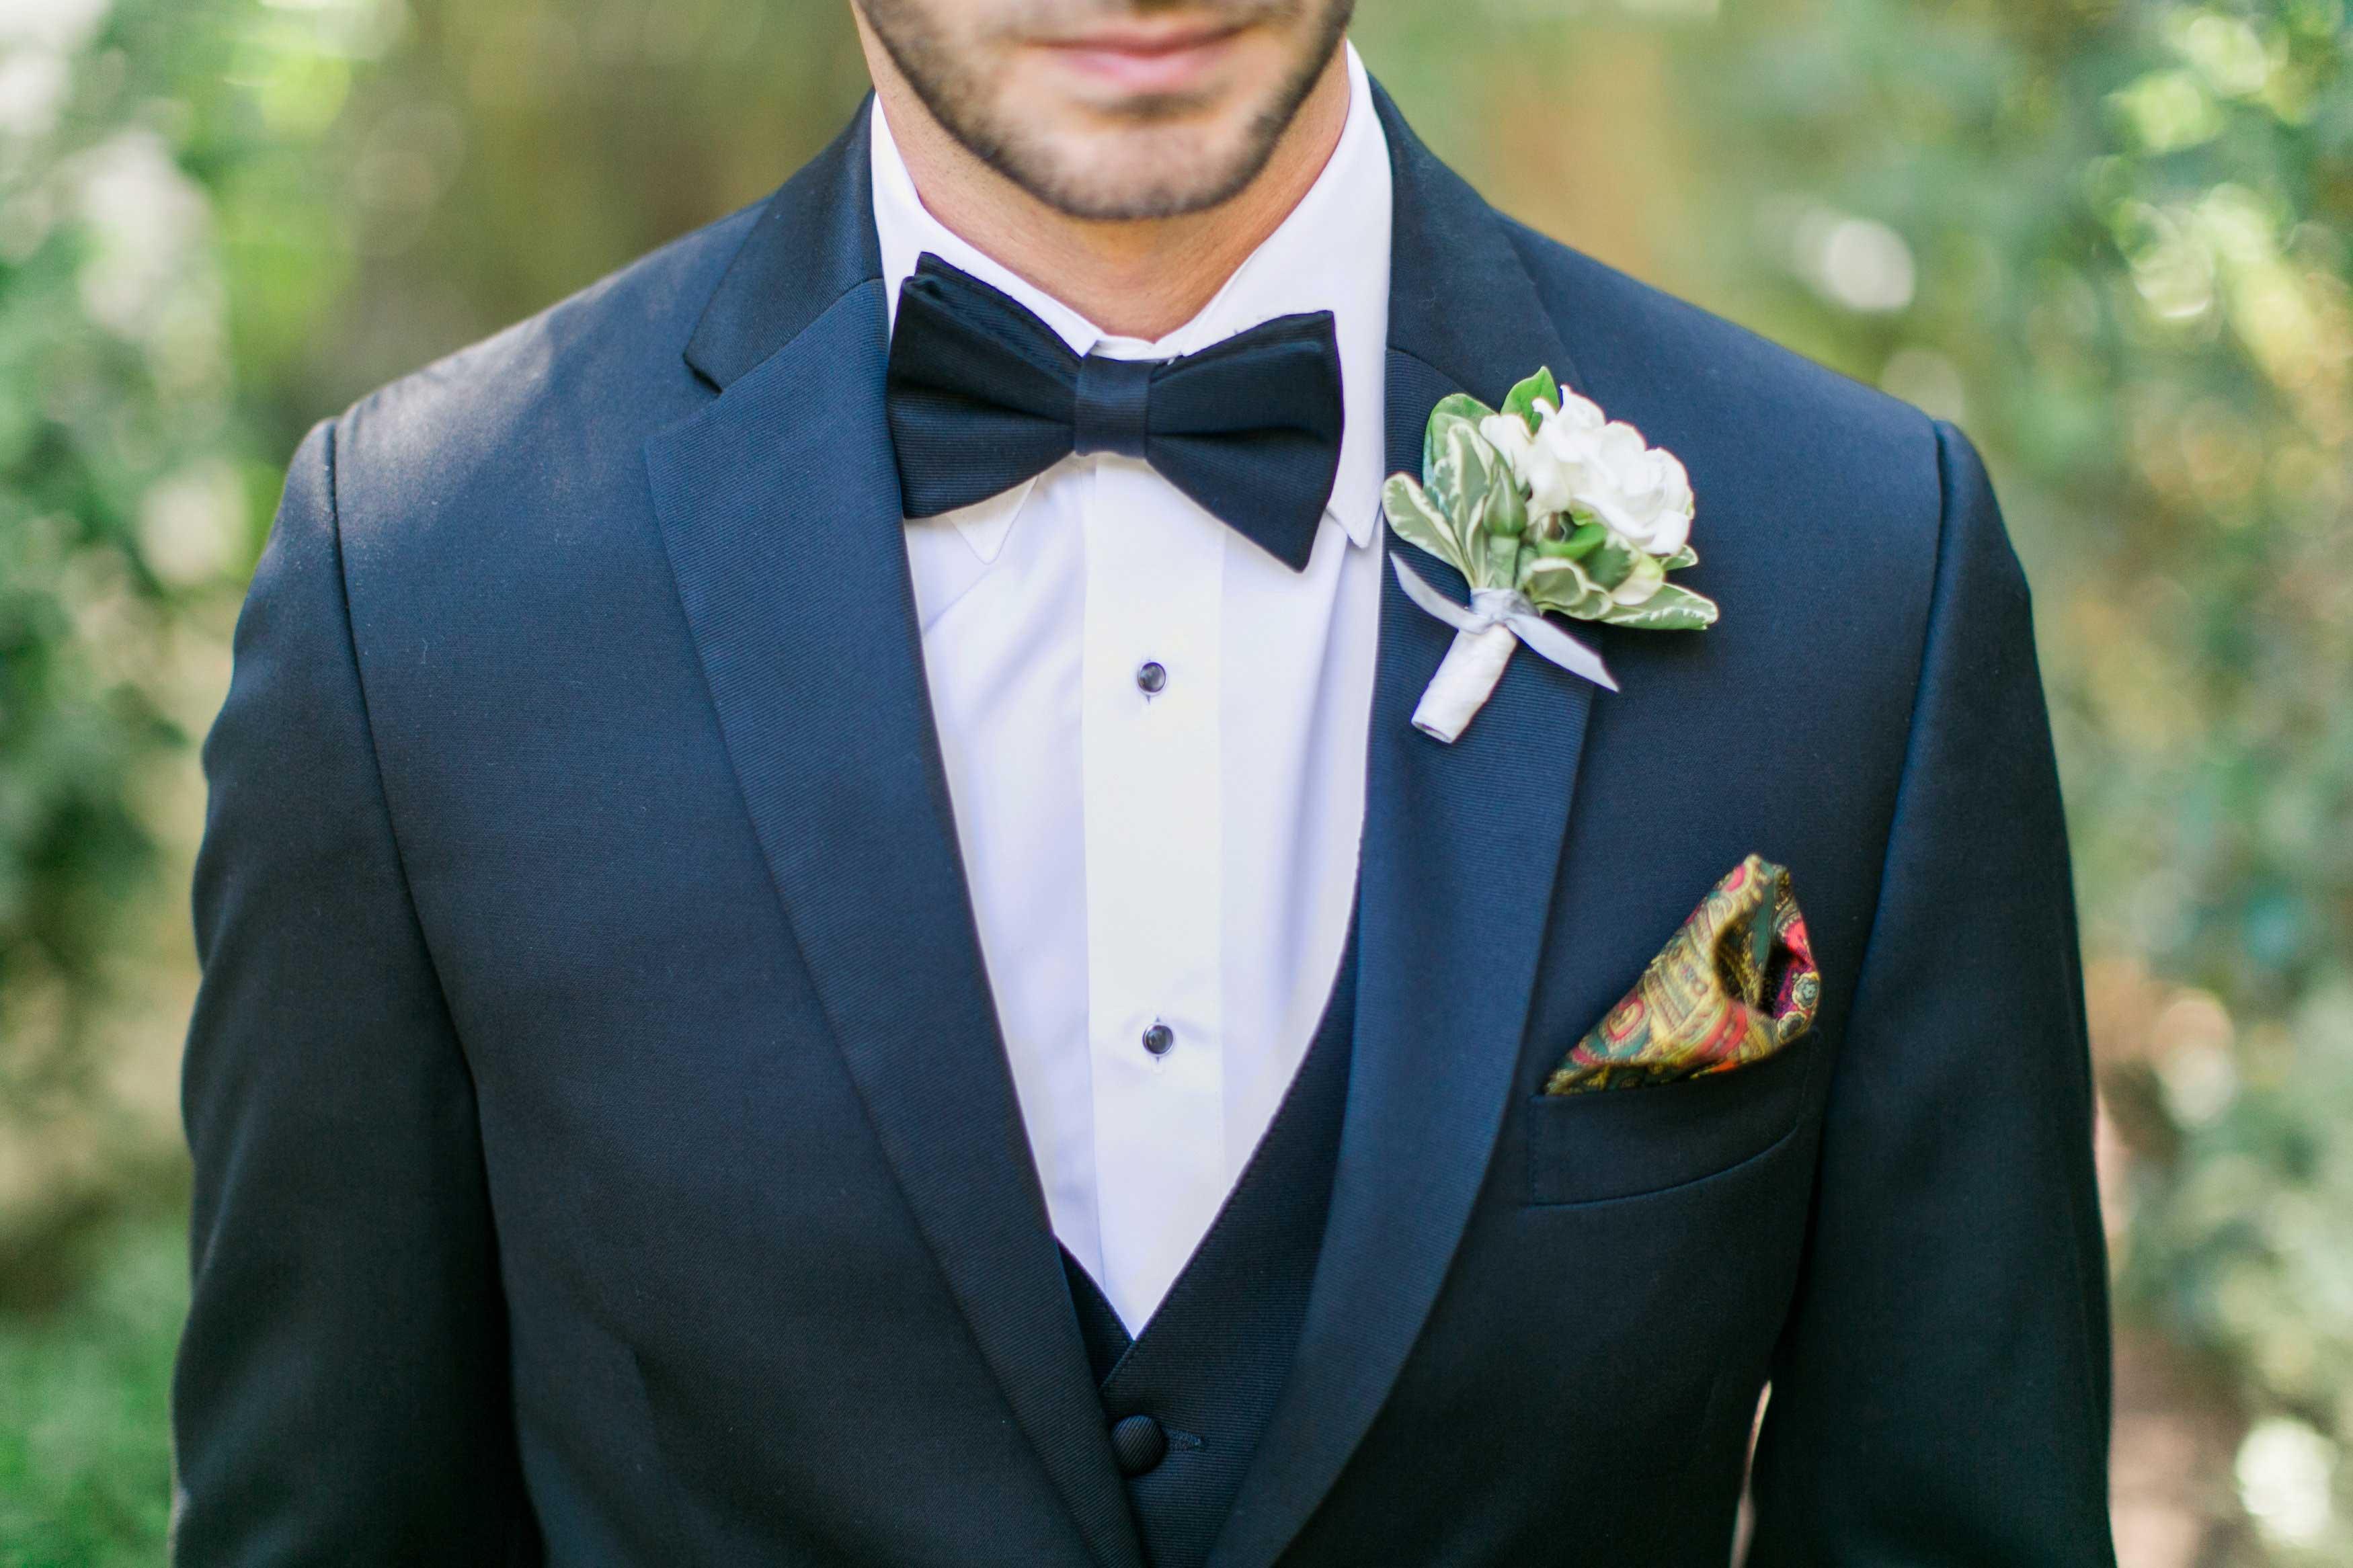 bryce harper wedding groom inspiration navy suits